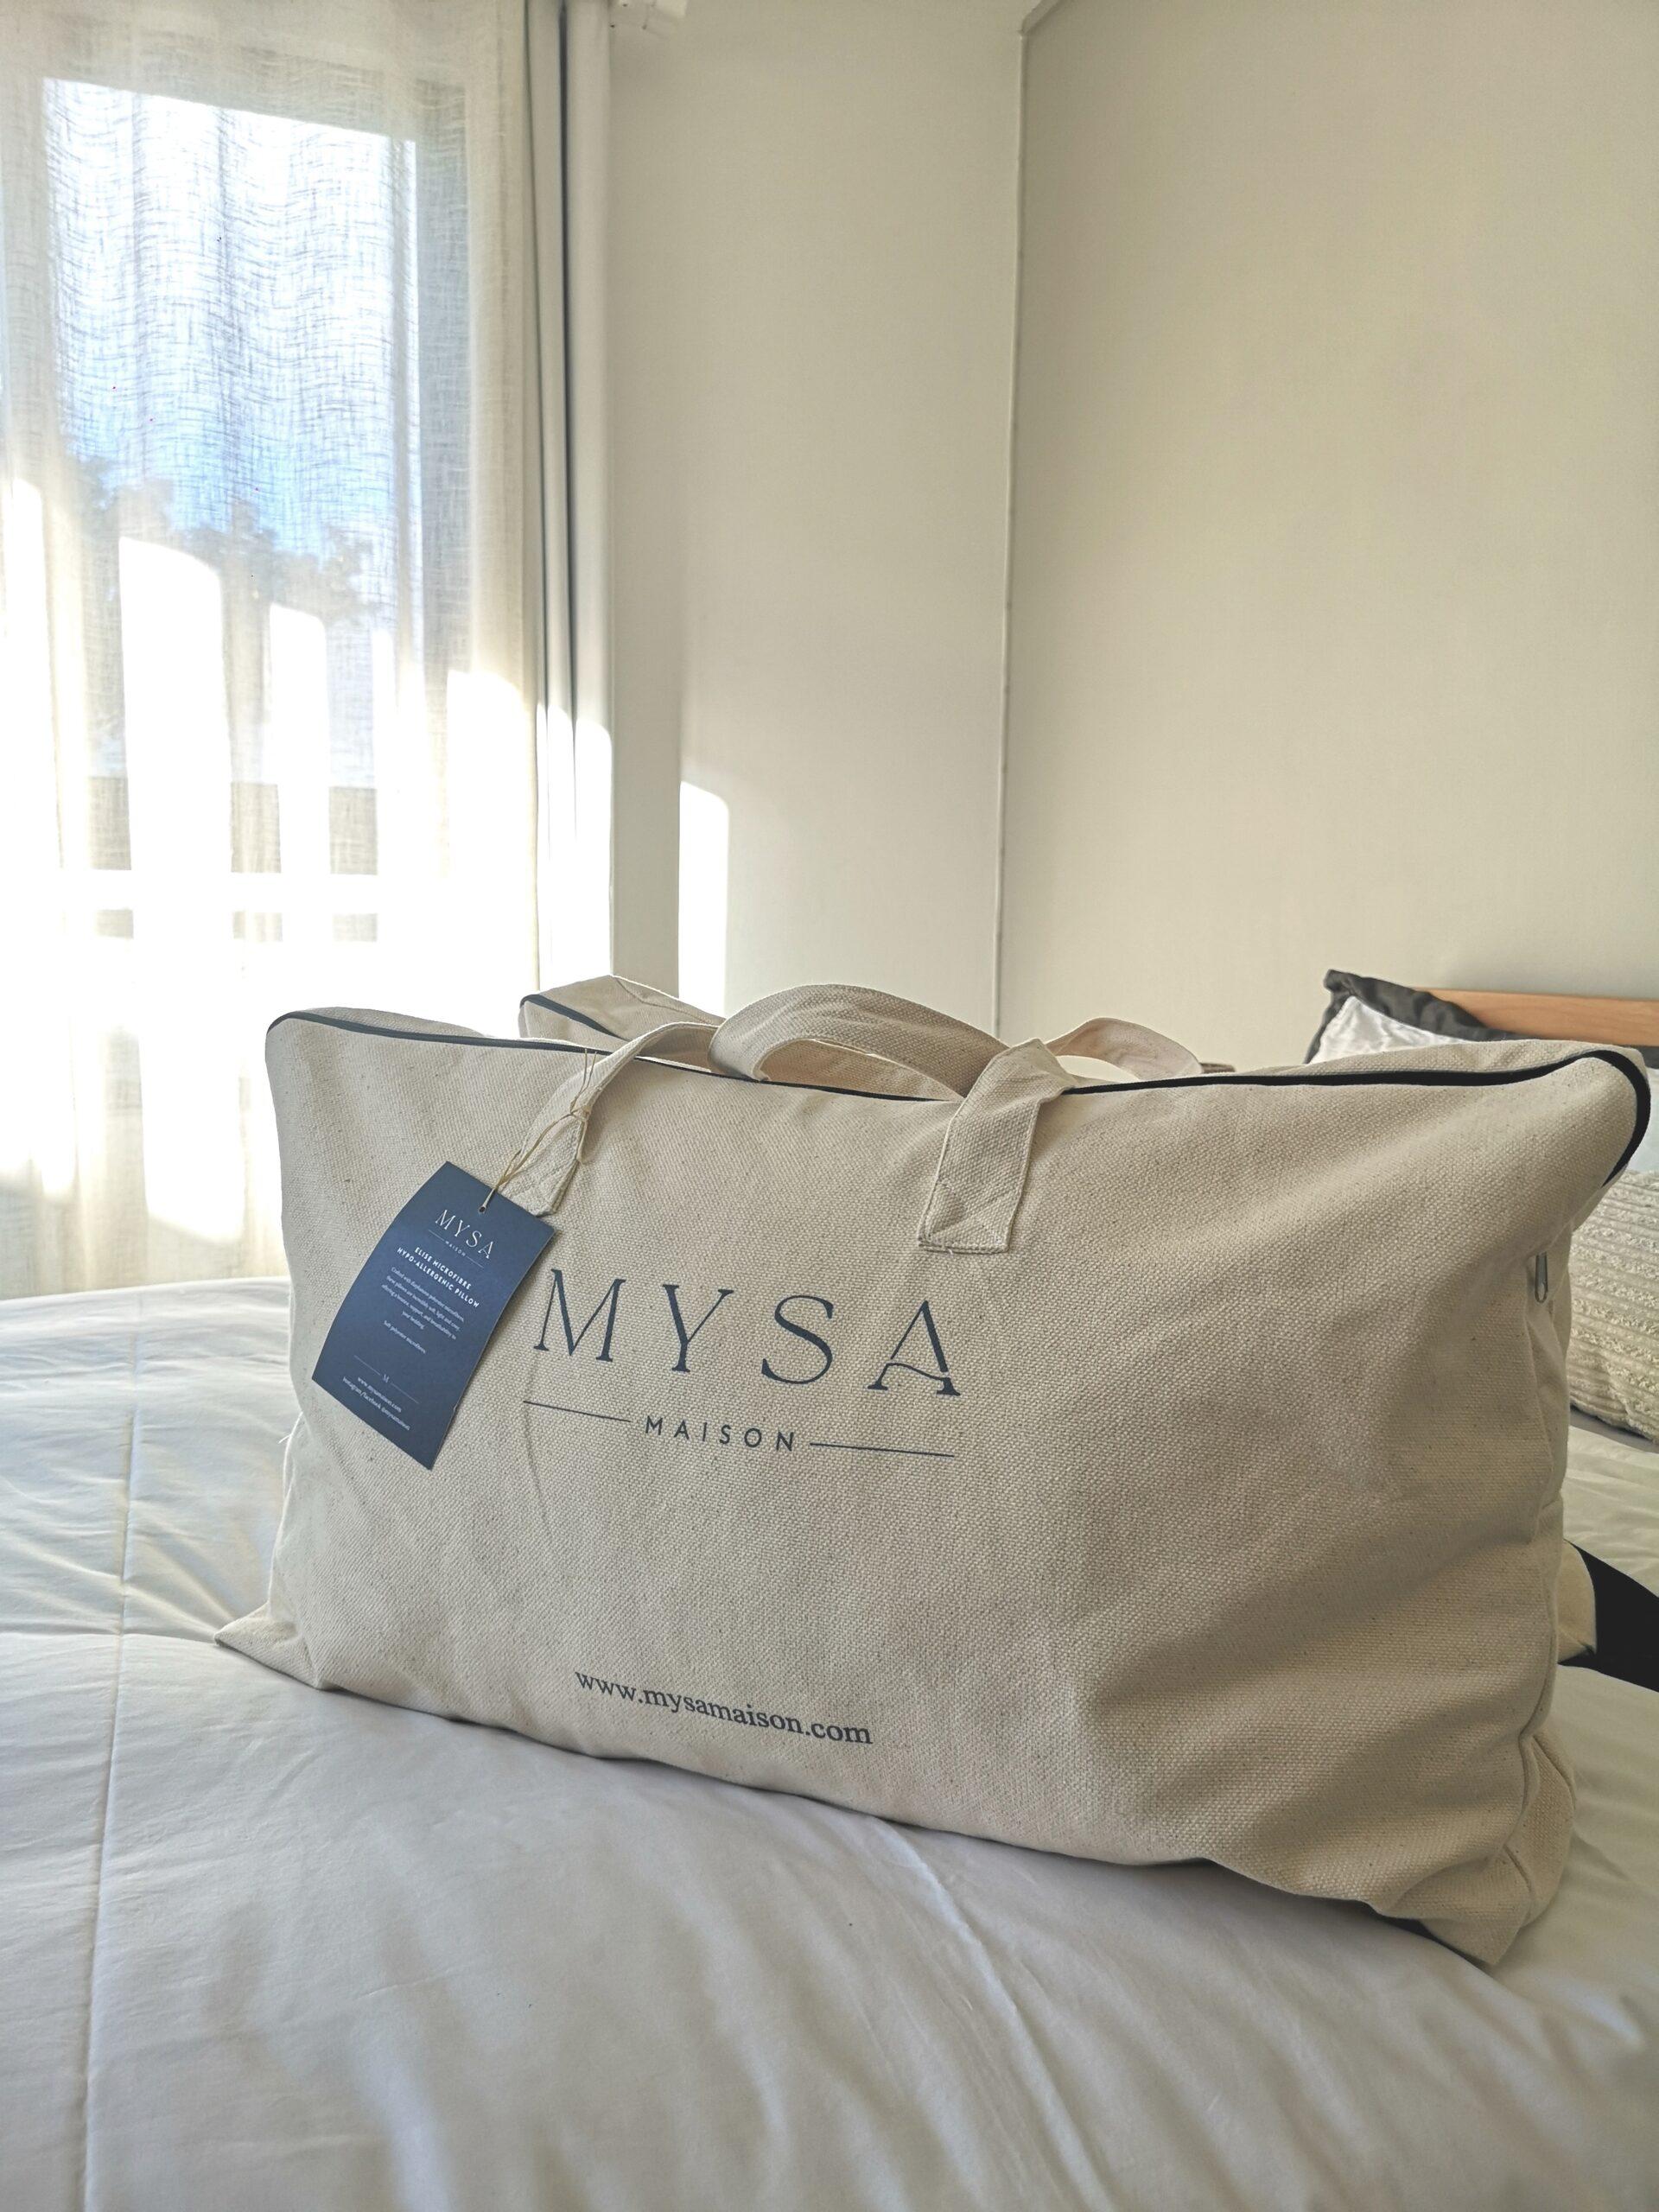 Mysa maison